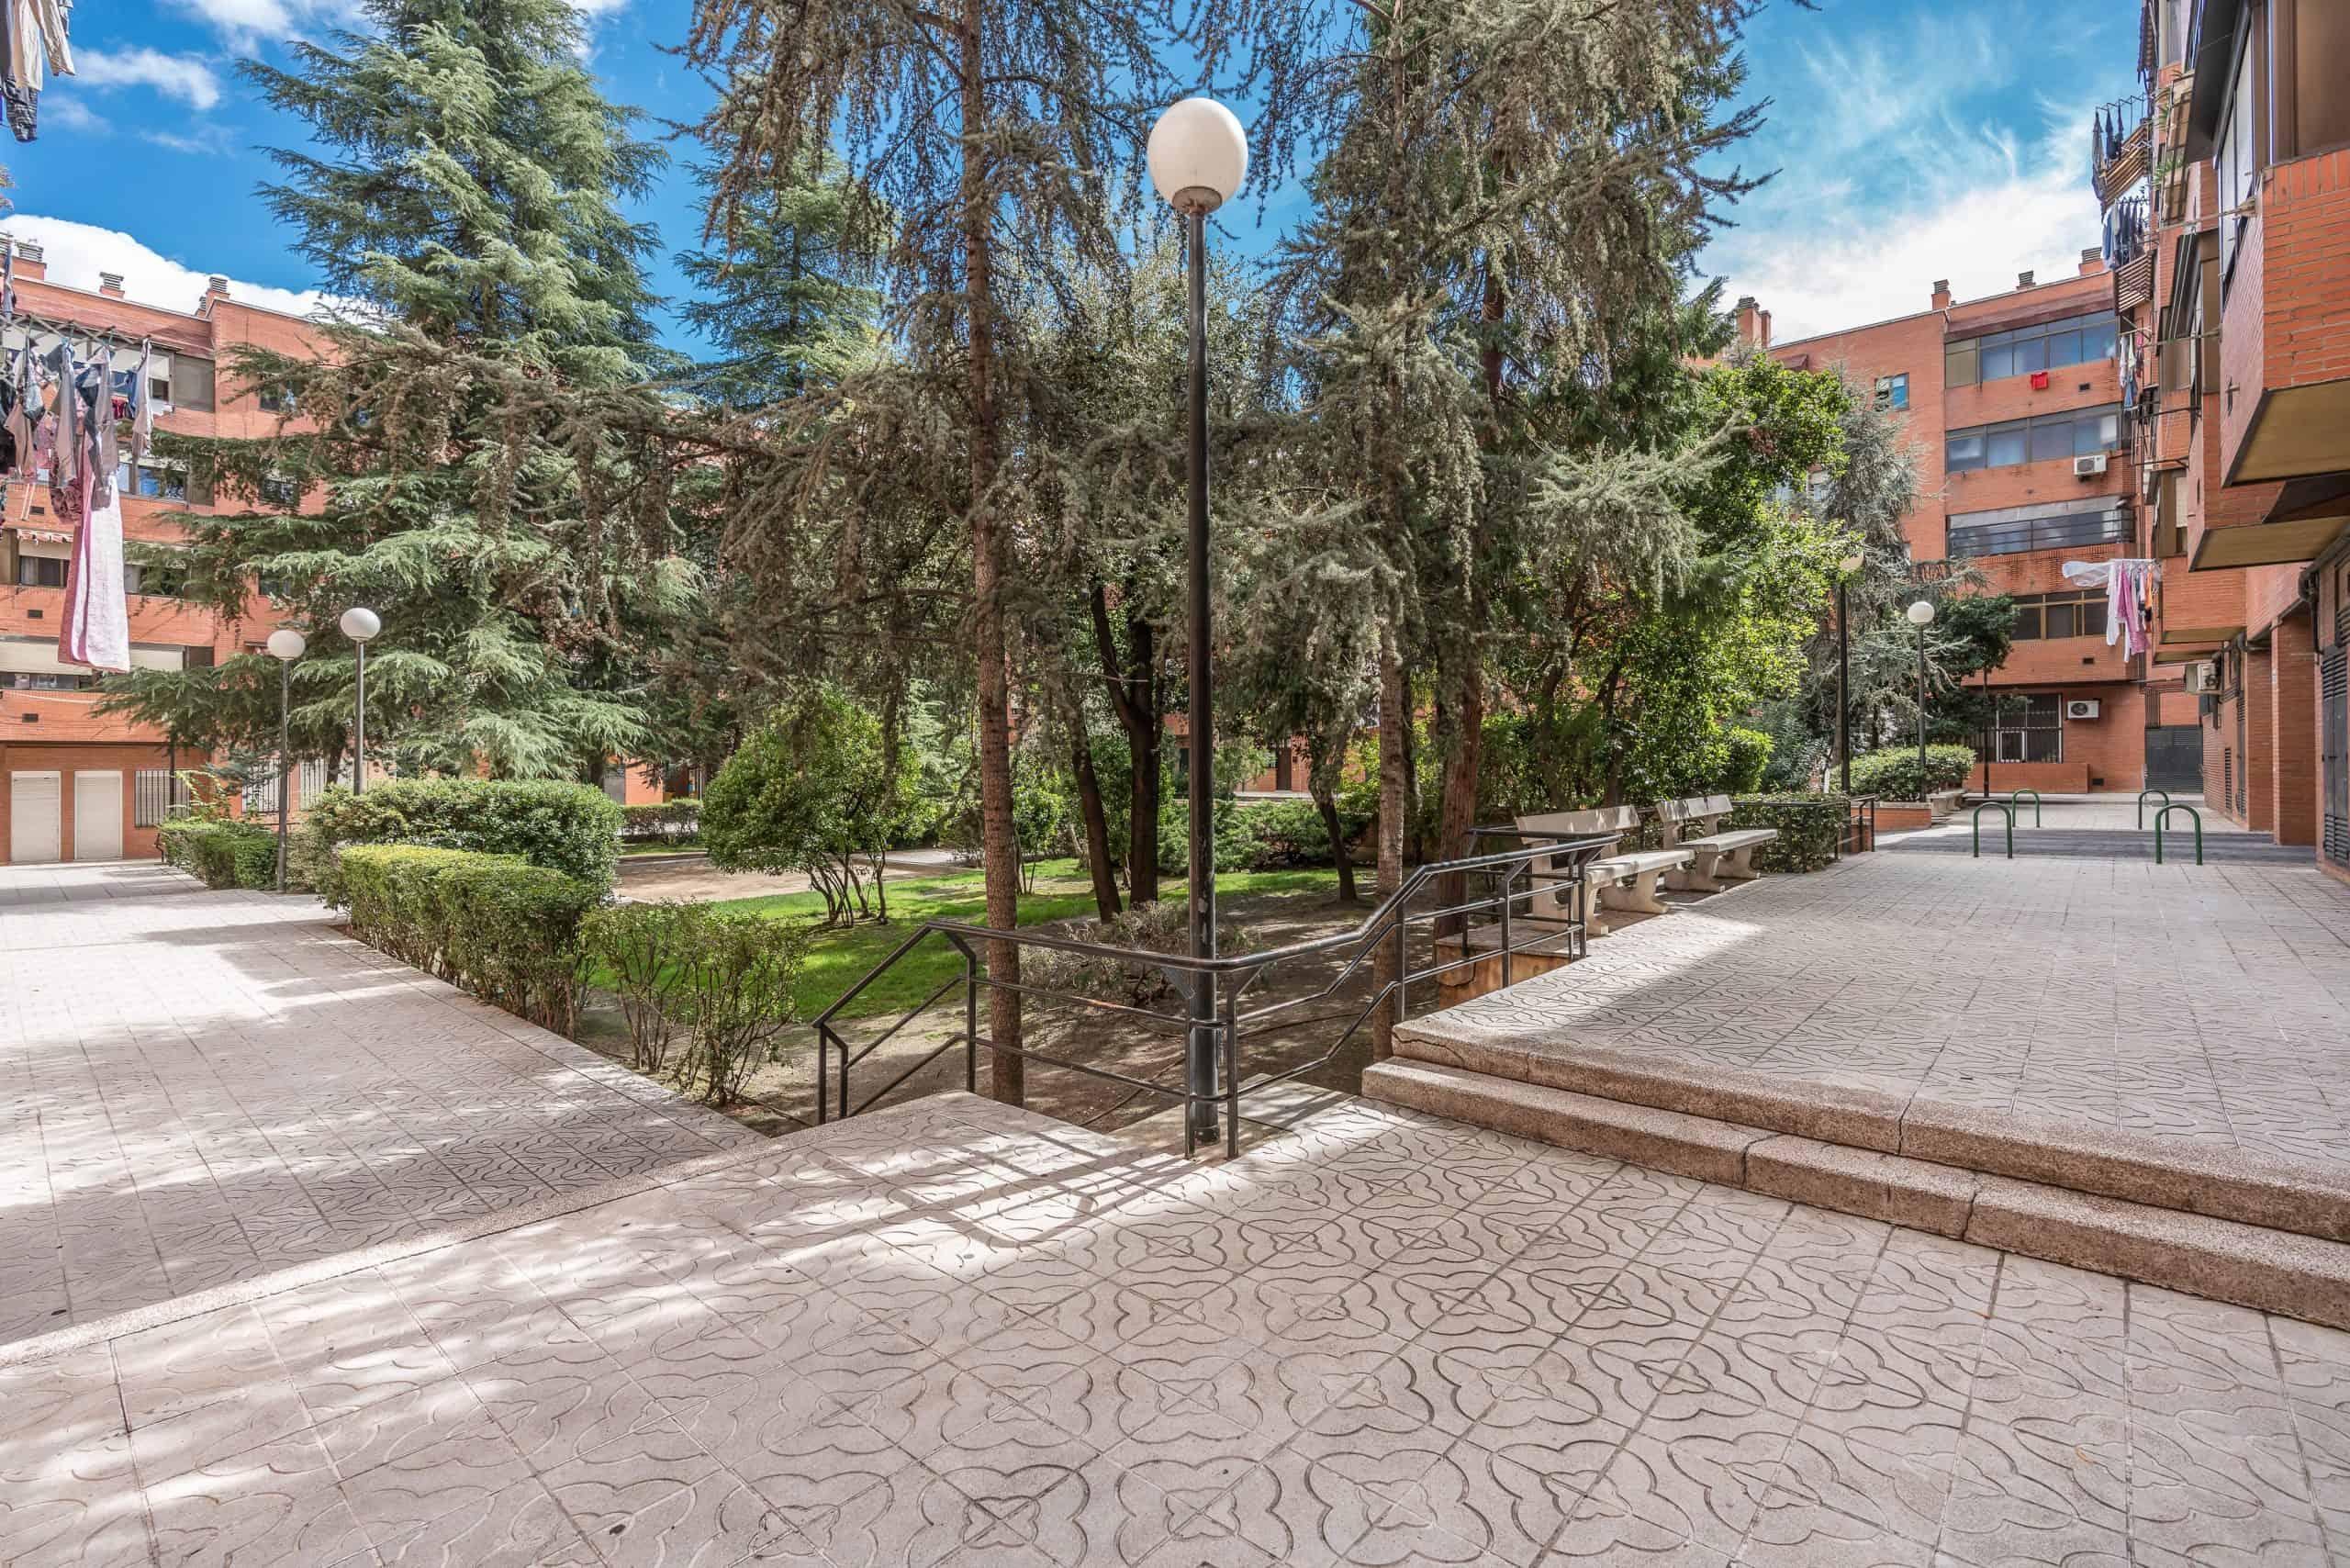 Agencia Inmobiliaria de Madrid-FUTUROCASA-ZONAS COMUNES (4)